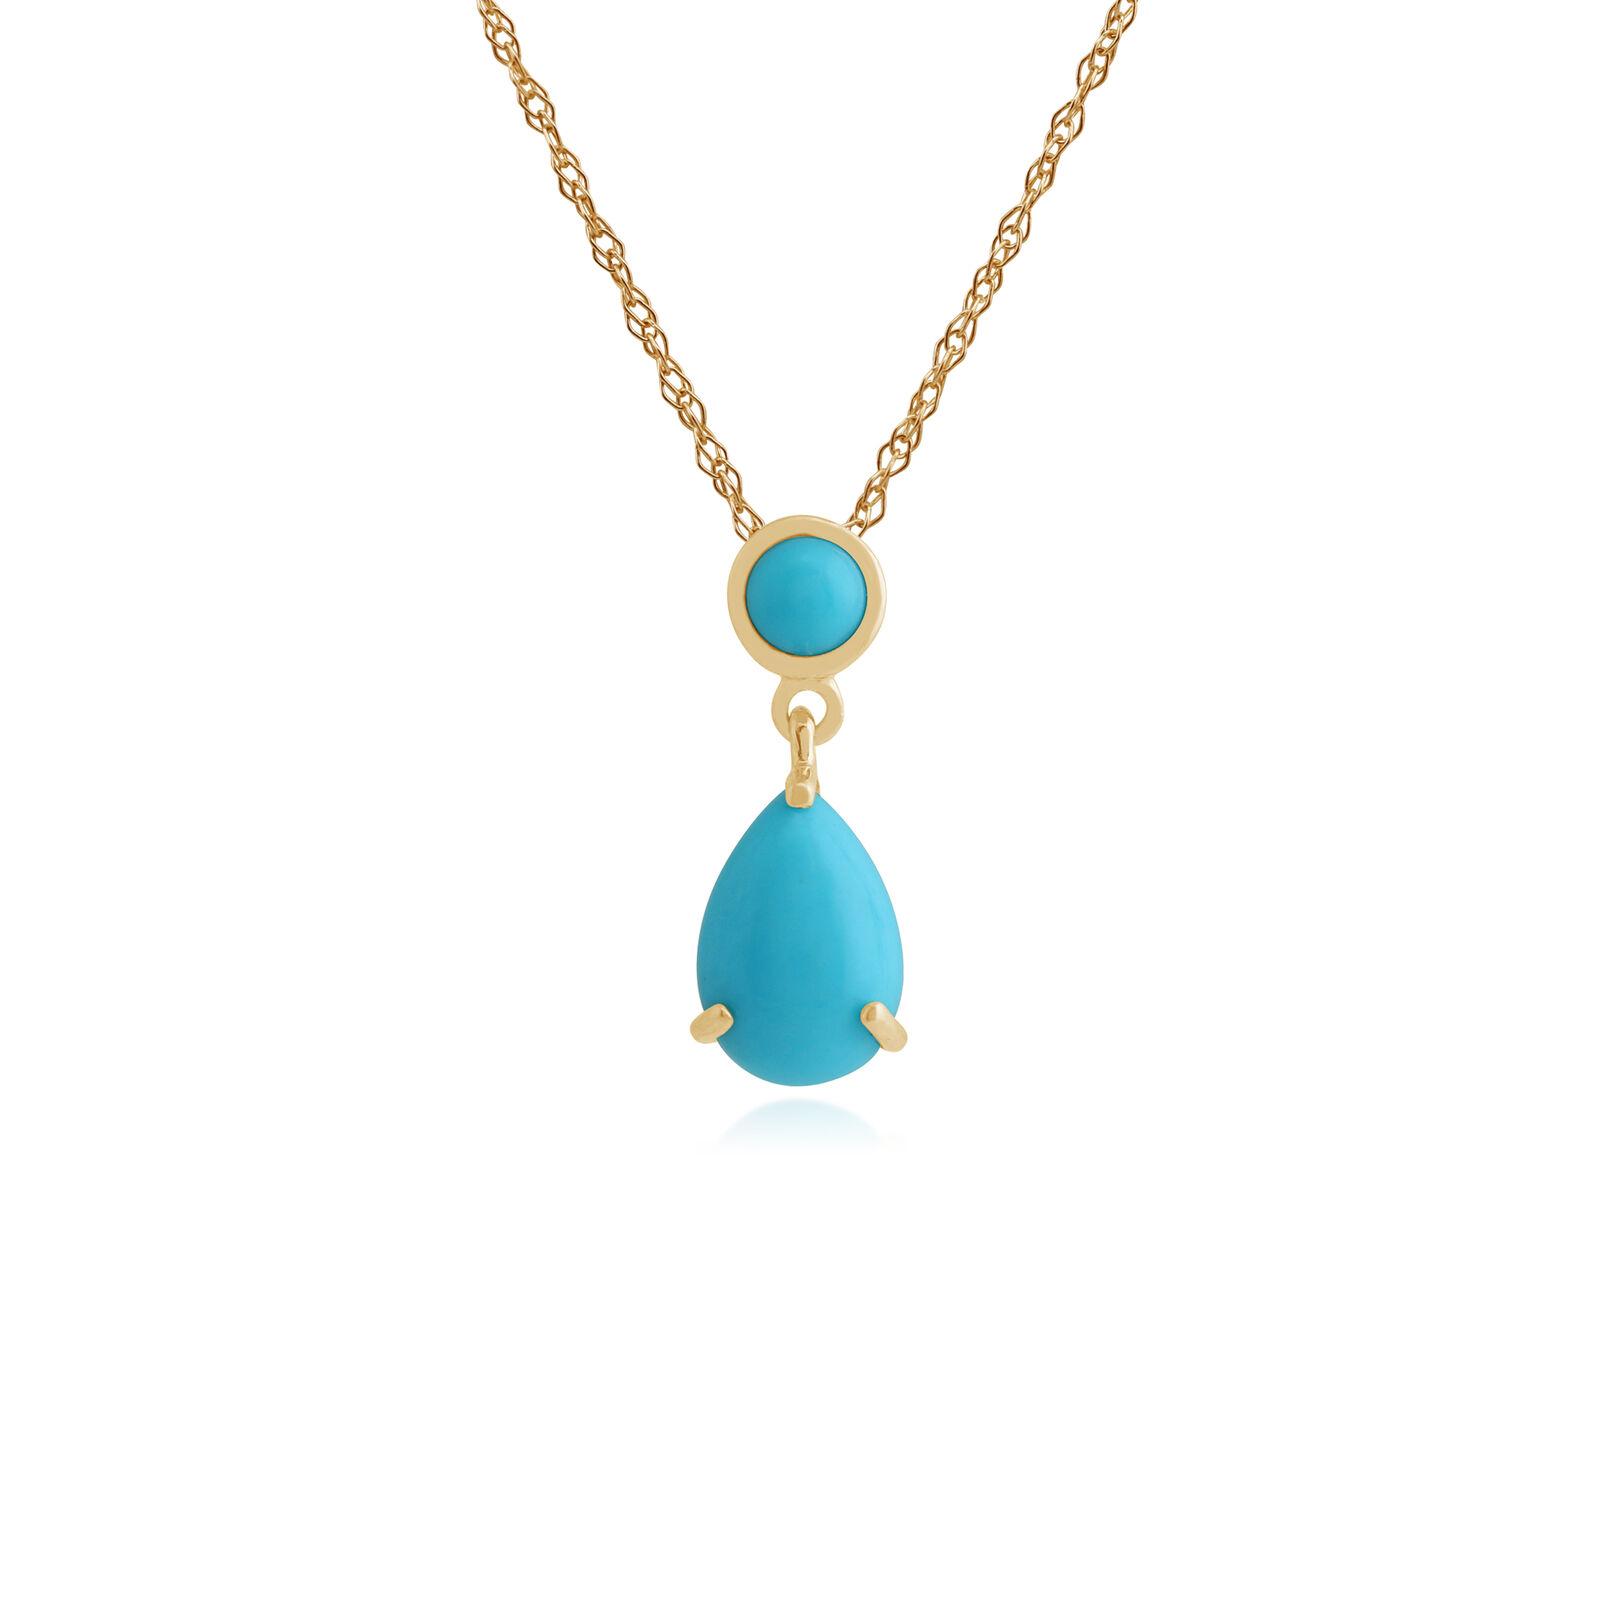 Gemondo 9ct Yellow gold 1.22ct Turquoise Pendant on 45cm Chain